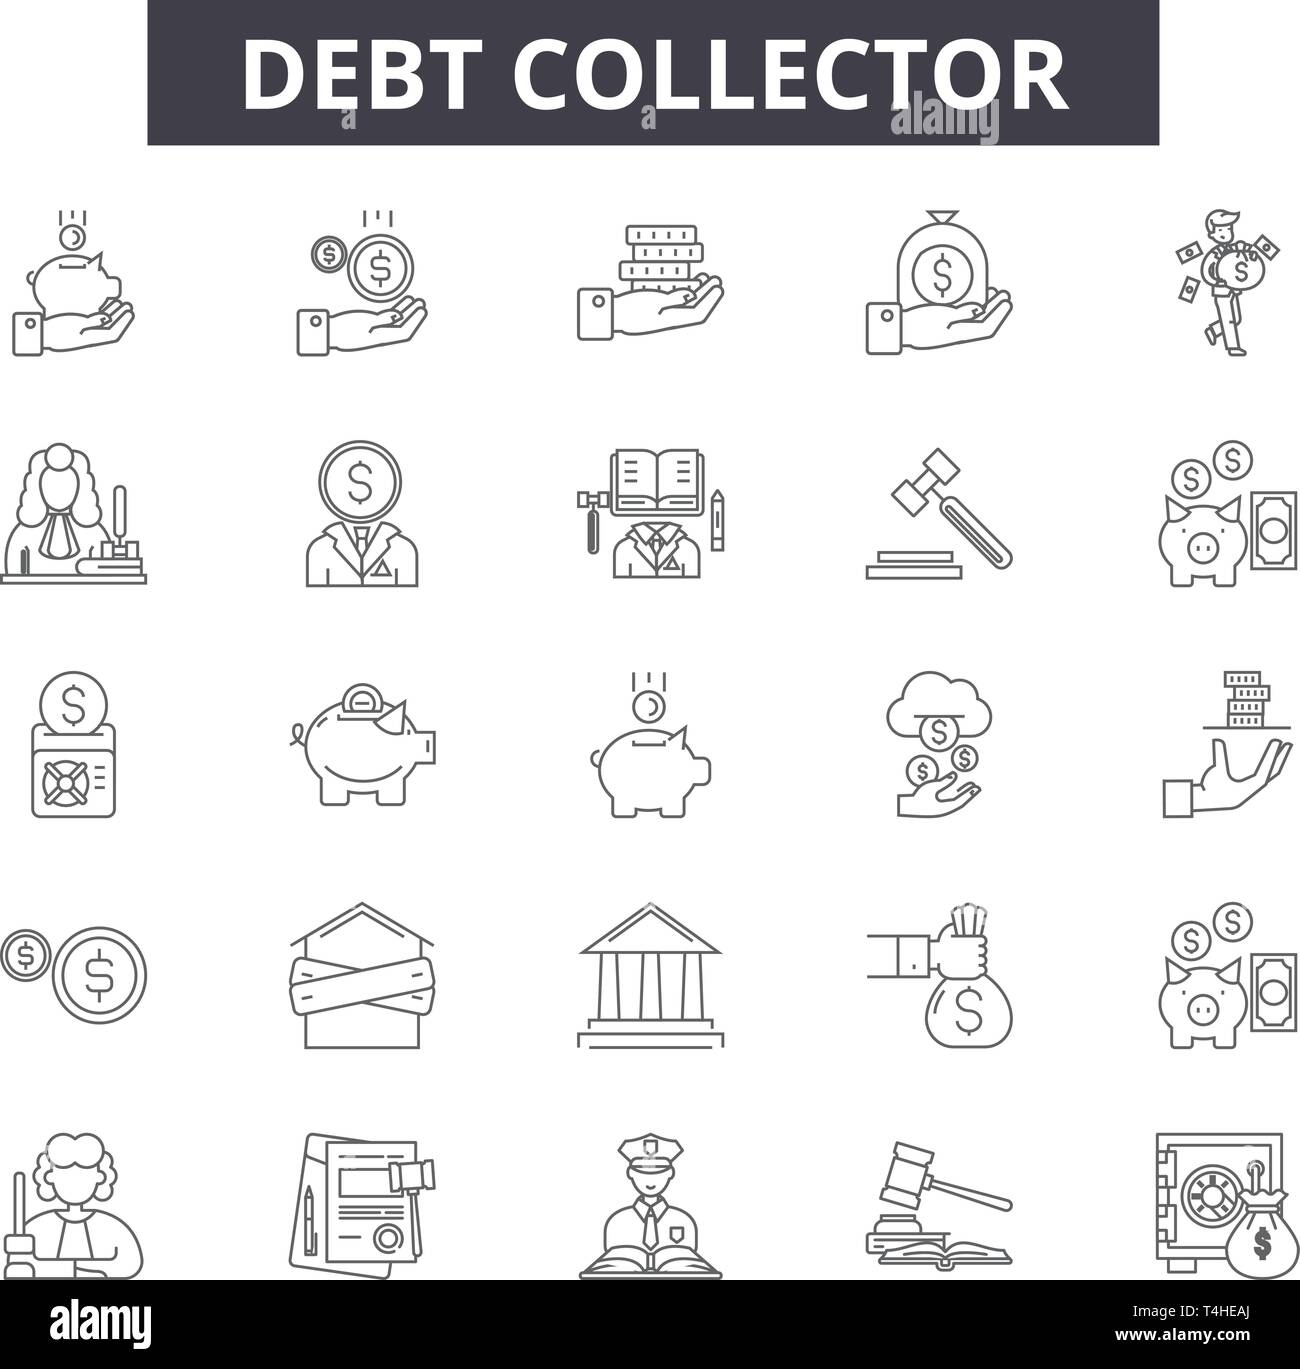 Debt collector line icons, signs set, vector. Debt collector outline concept illustration: debt,money,collector,business,finance,bank,concept,financia - Stock Image